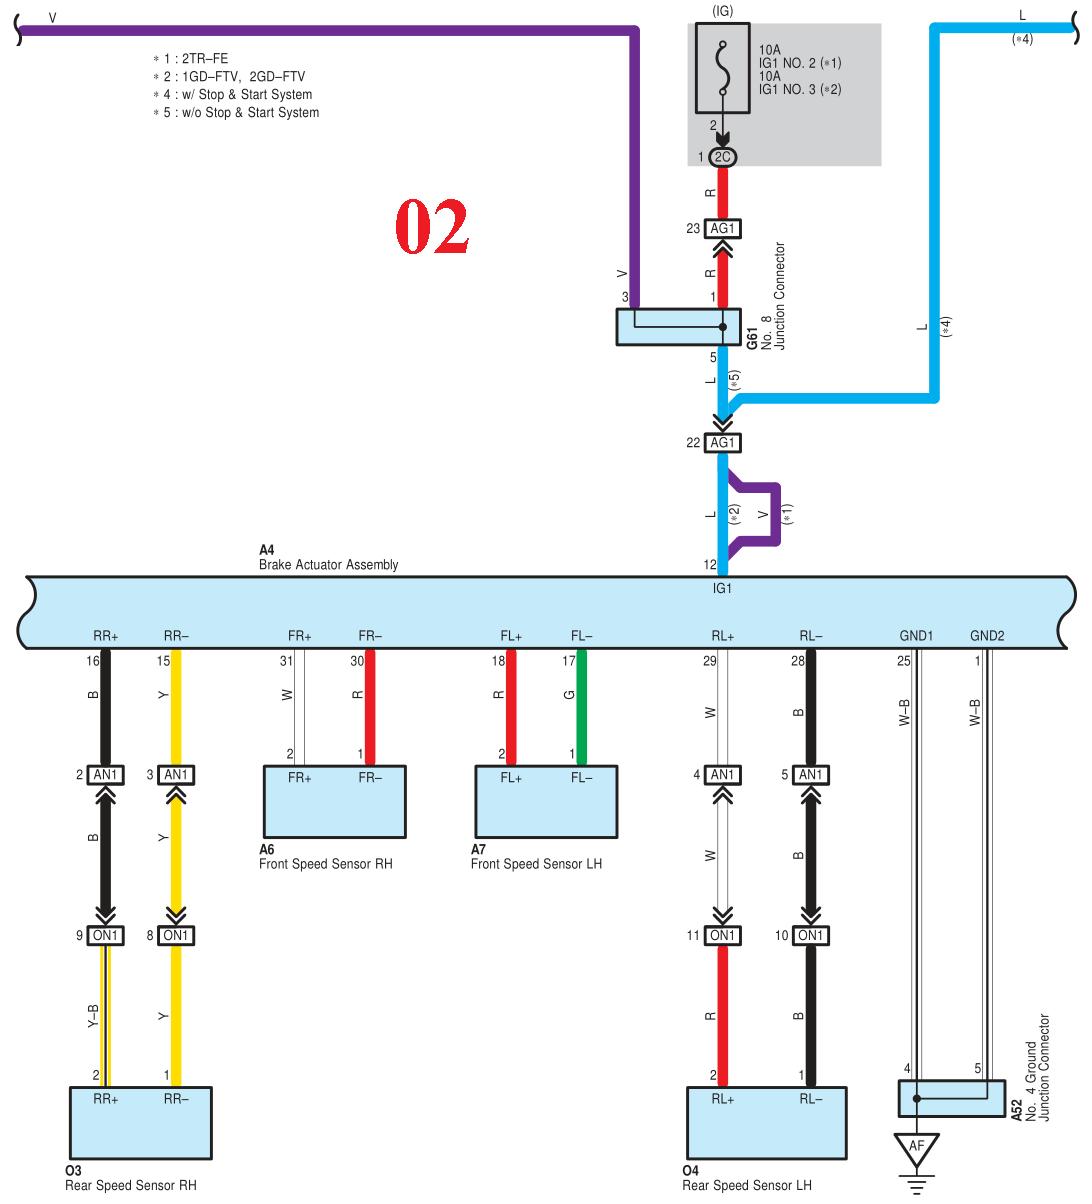 [DIAGRAM_4PO]  GA_6603] Toyota Revo Wiring Diagram Schematic Wiring | Wiring Diagram Of Toyota Revo |  | Ginou Sianu Kesian Illuminateatx Librar Wiring 101